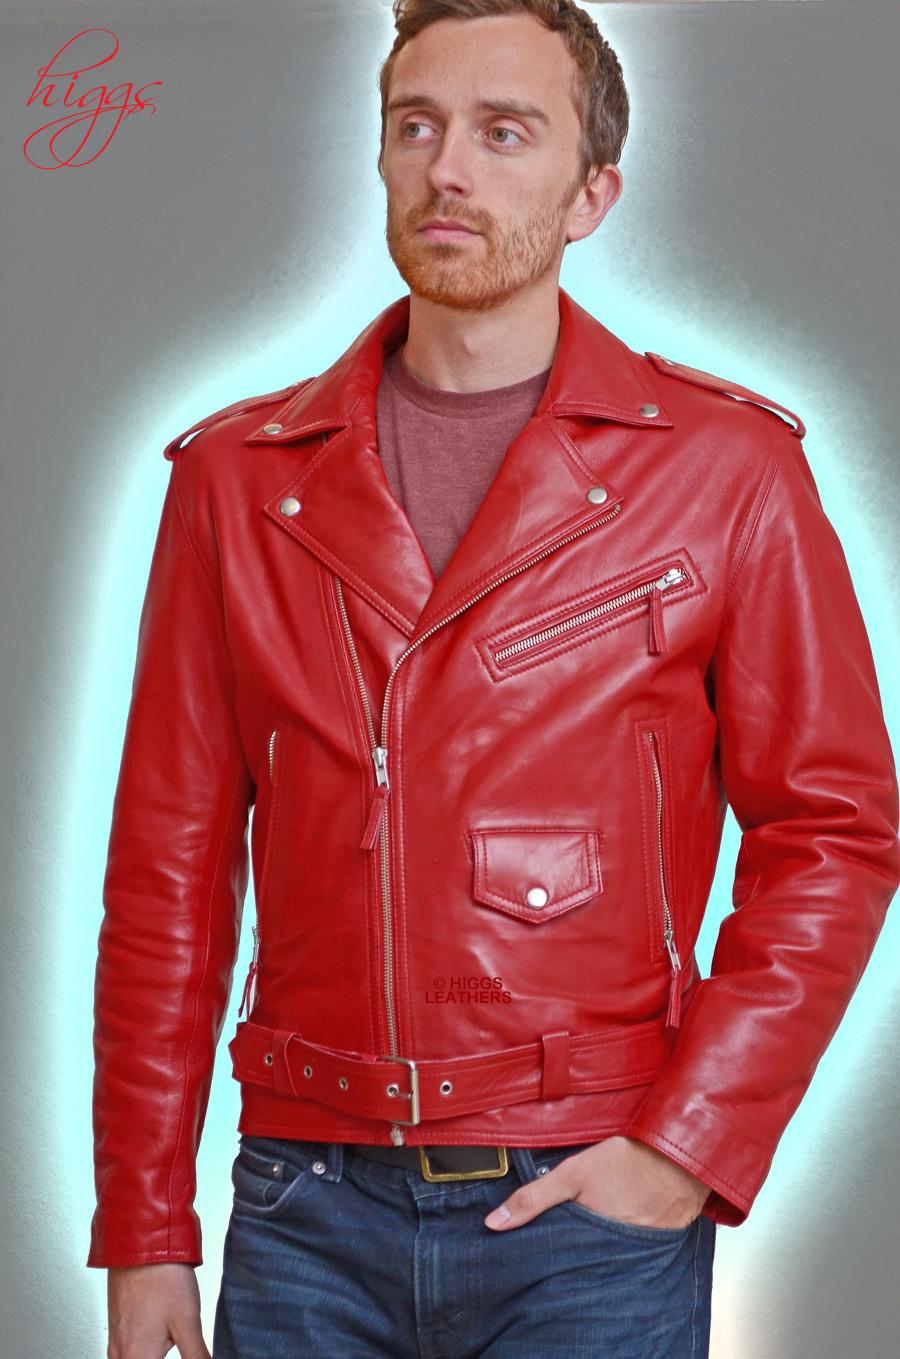 Higgs Leathers Buy Stock Brandex Men S Red Leather Biker Jackets